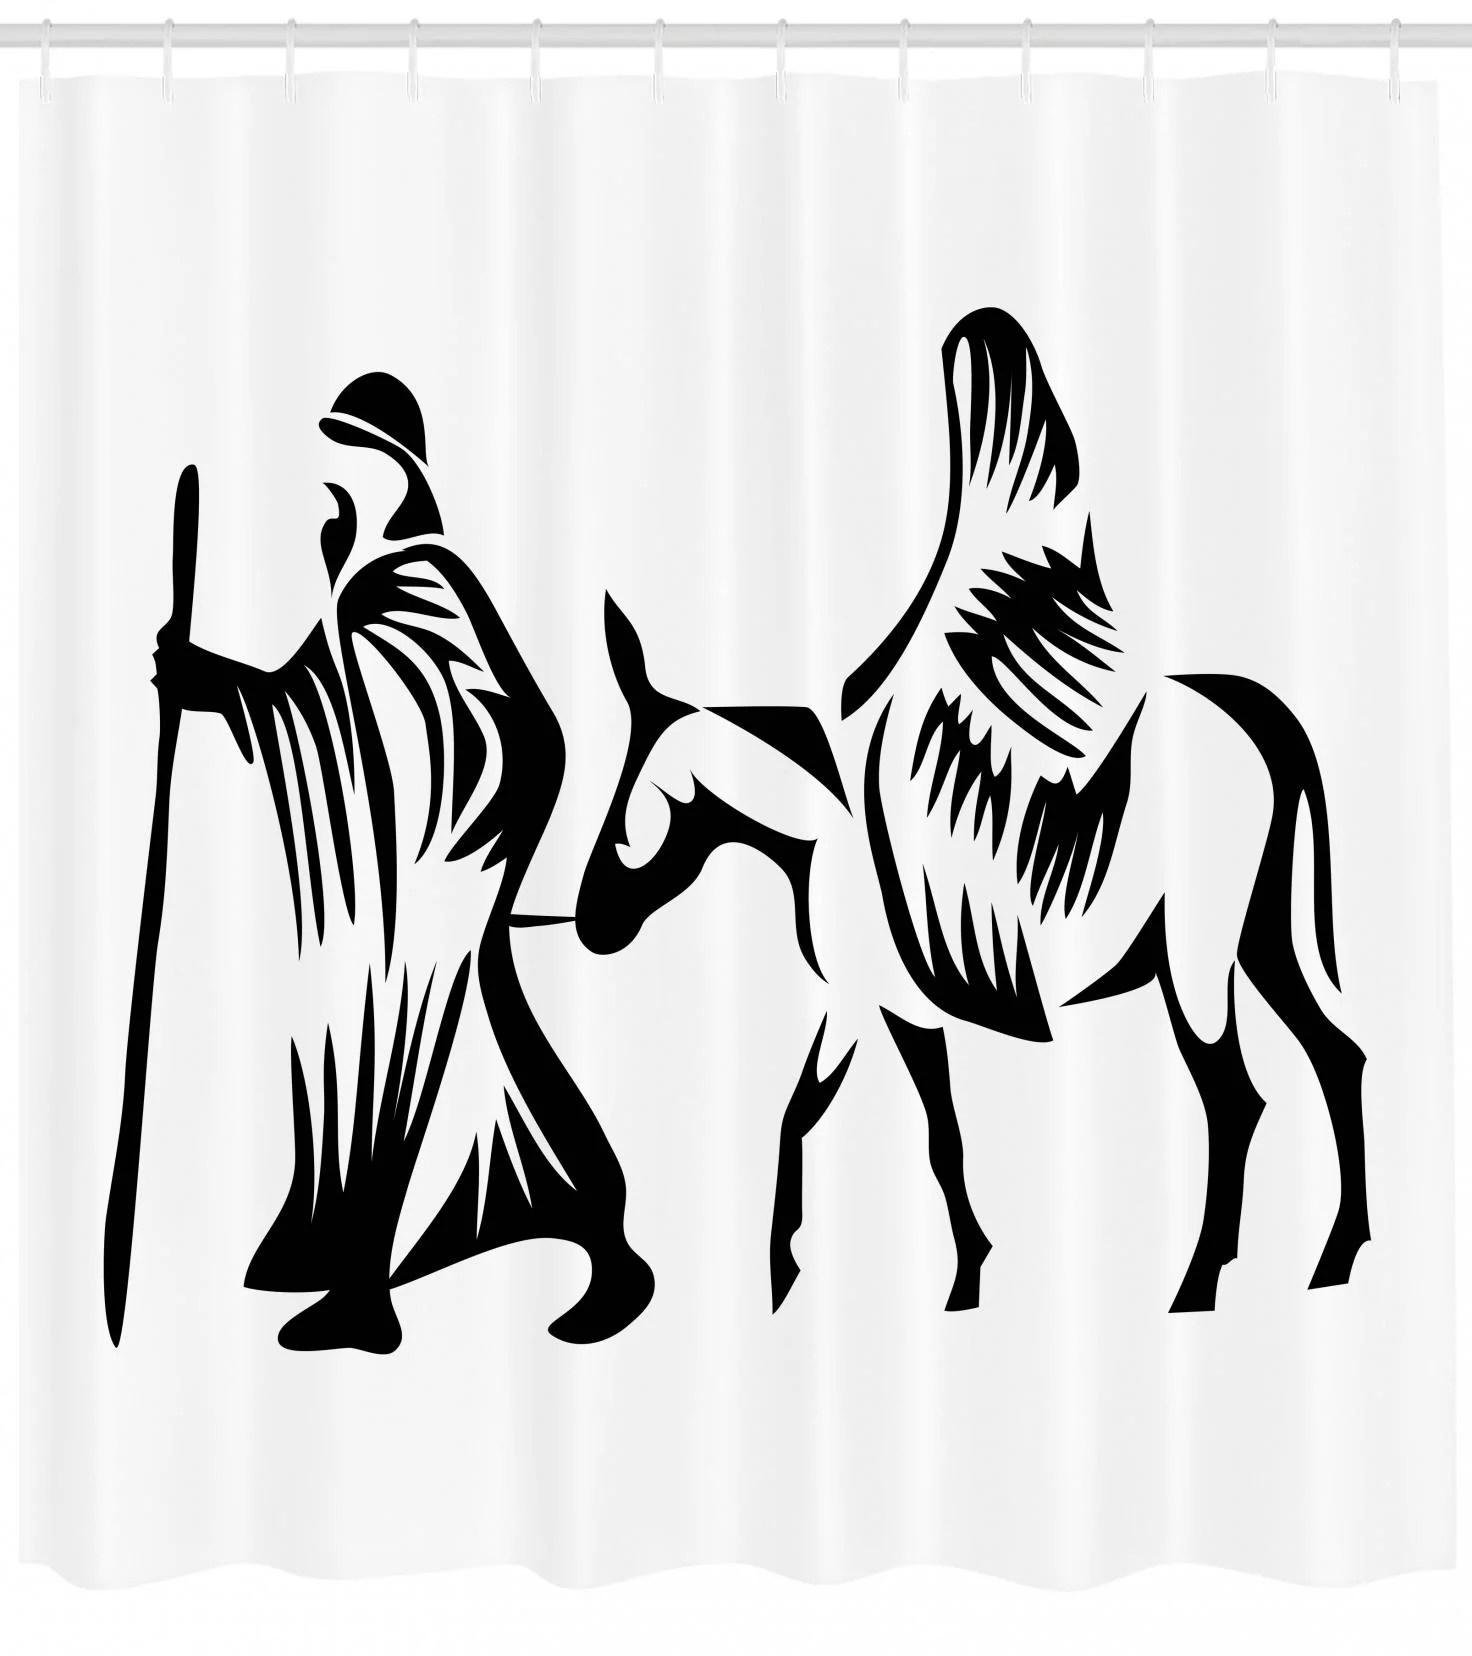 Religious Shower Curtain Silhouette Religious Figures